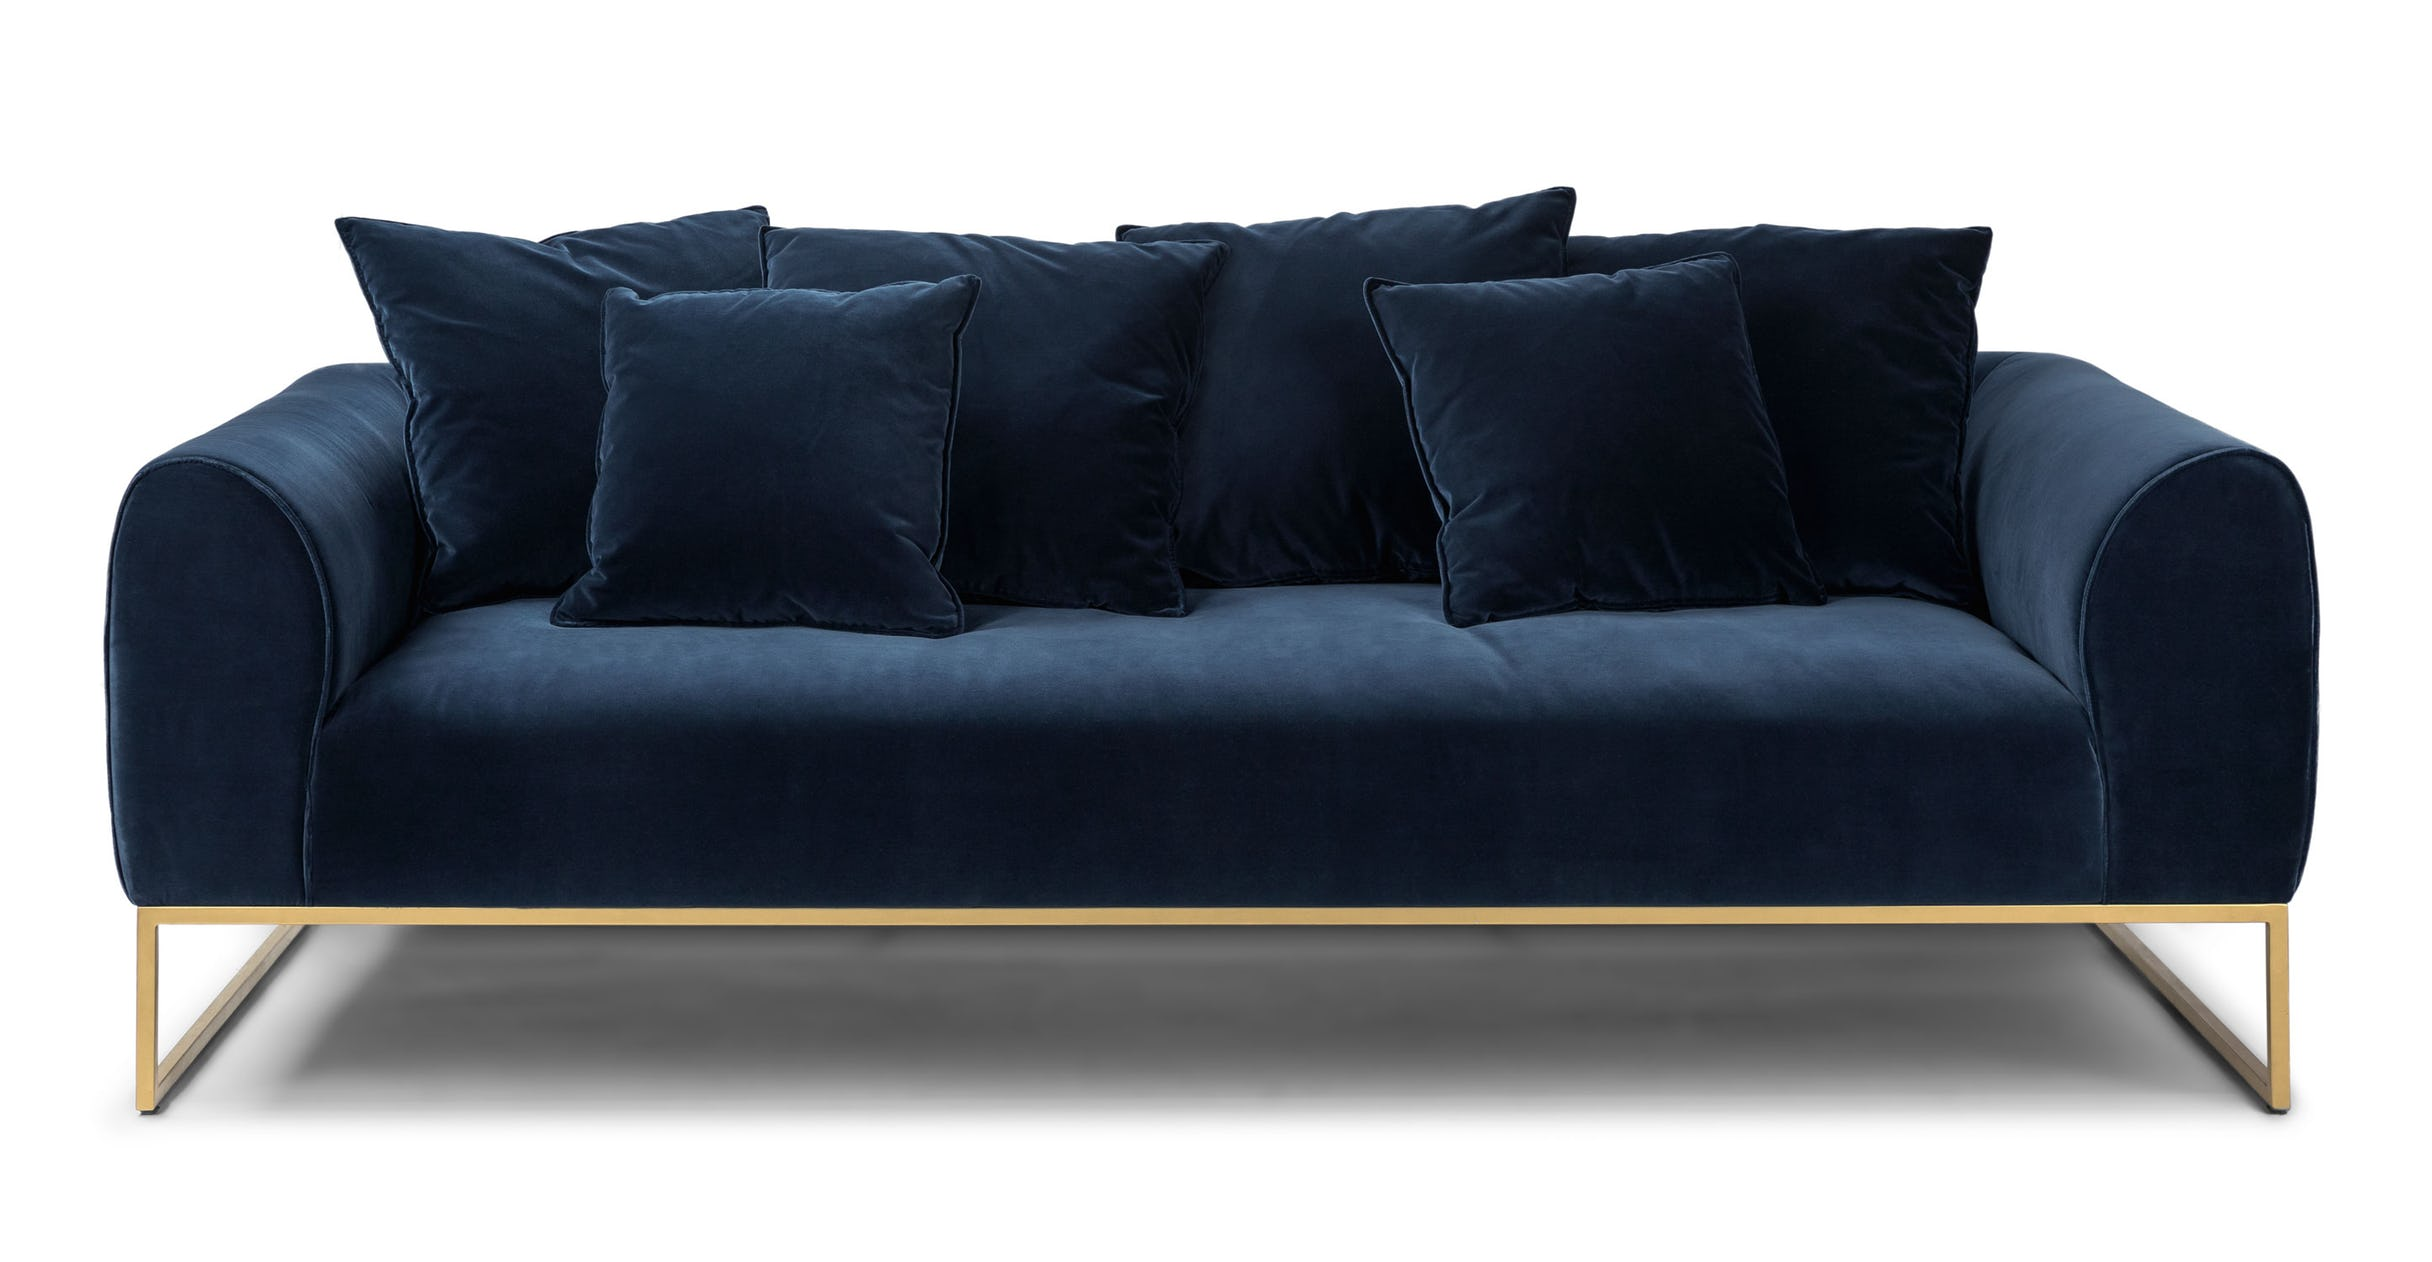 Kits Cascadia Blue Sofa | Luxury furniture sofa, Mid ... on Cascadia Outdoor Living Spaces id=43343